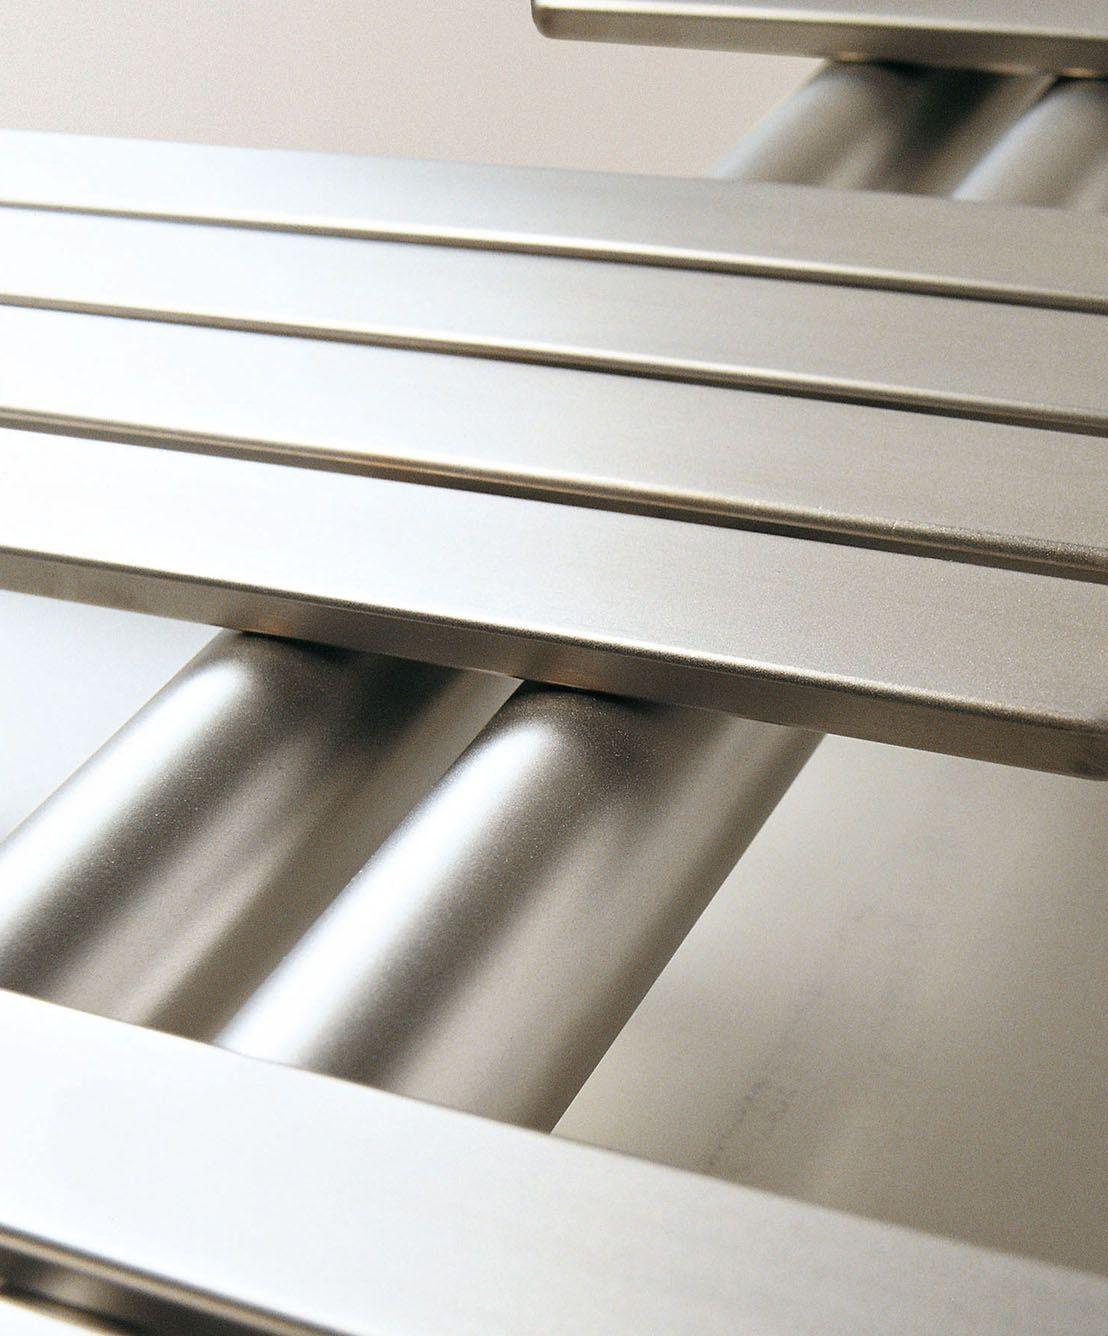 Calorifer baie Babyla Satin Stainless Steel 1080x600 mm, 233 W